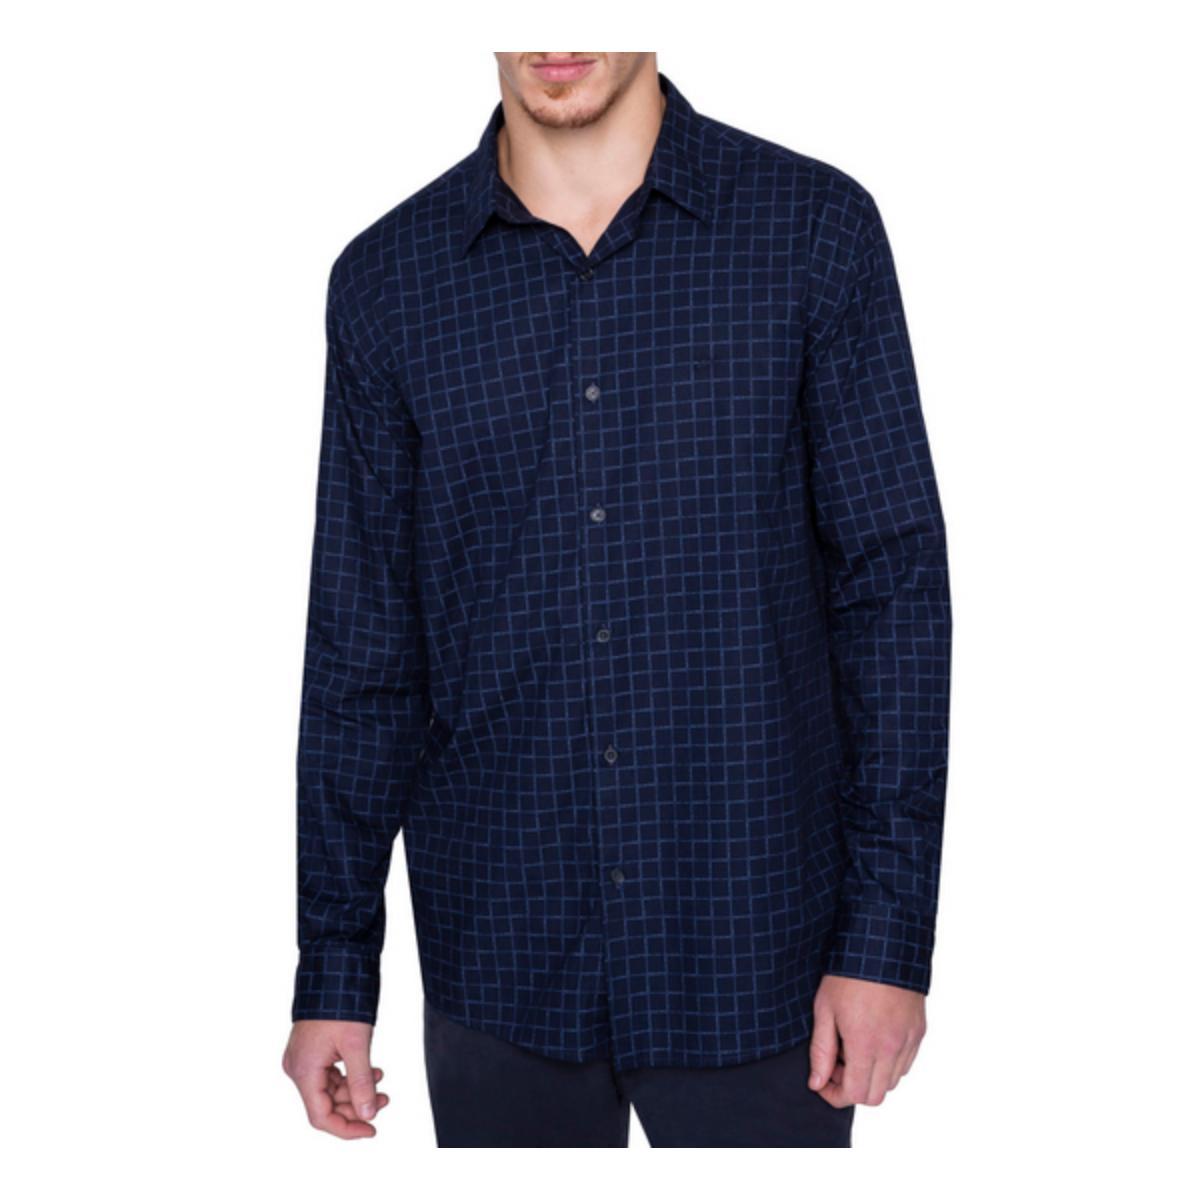 Camisa Masculina Ellus 52b7580 75 Marinho